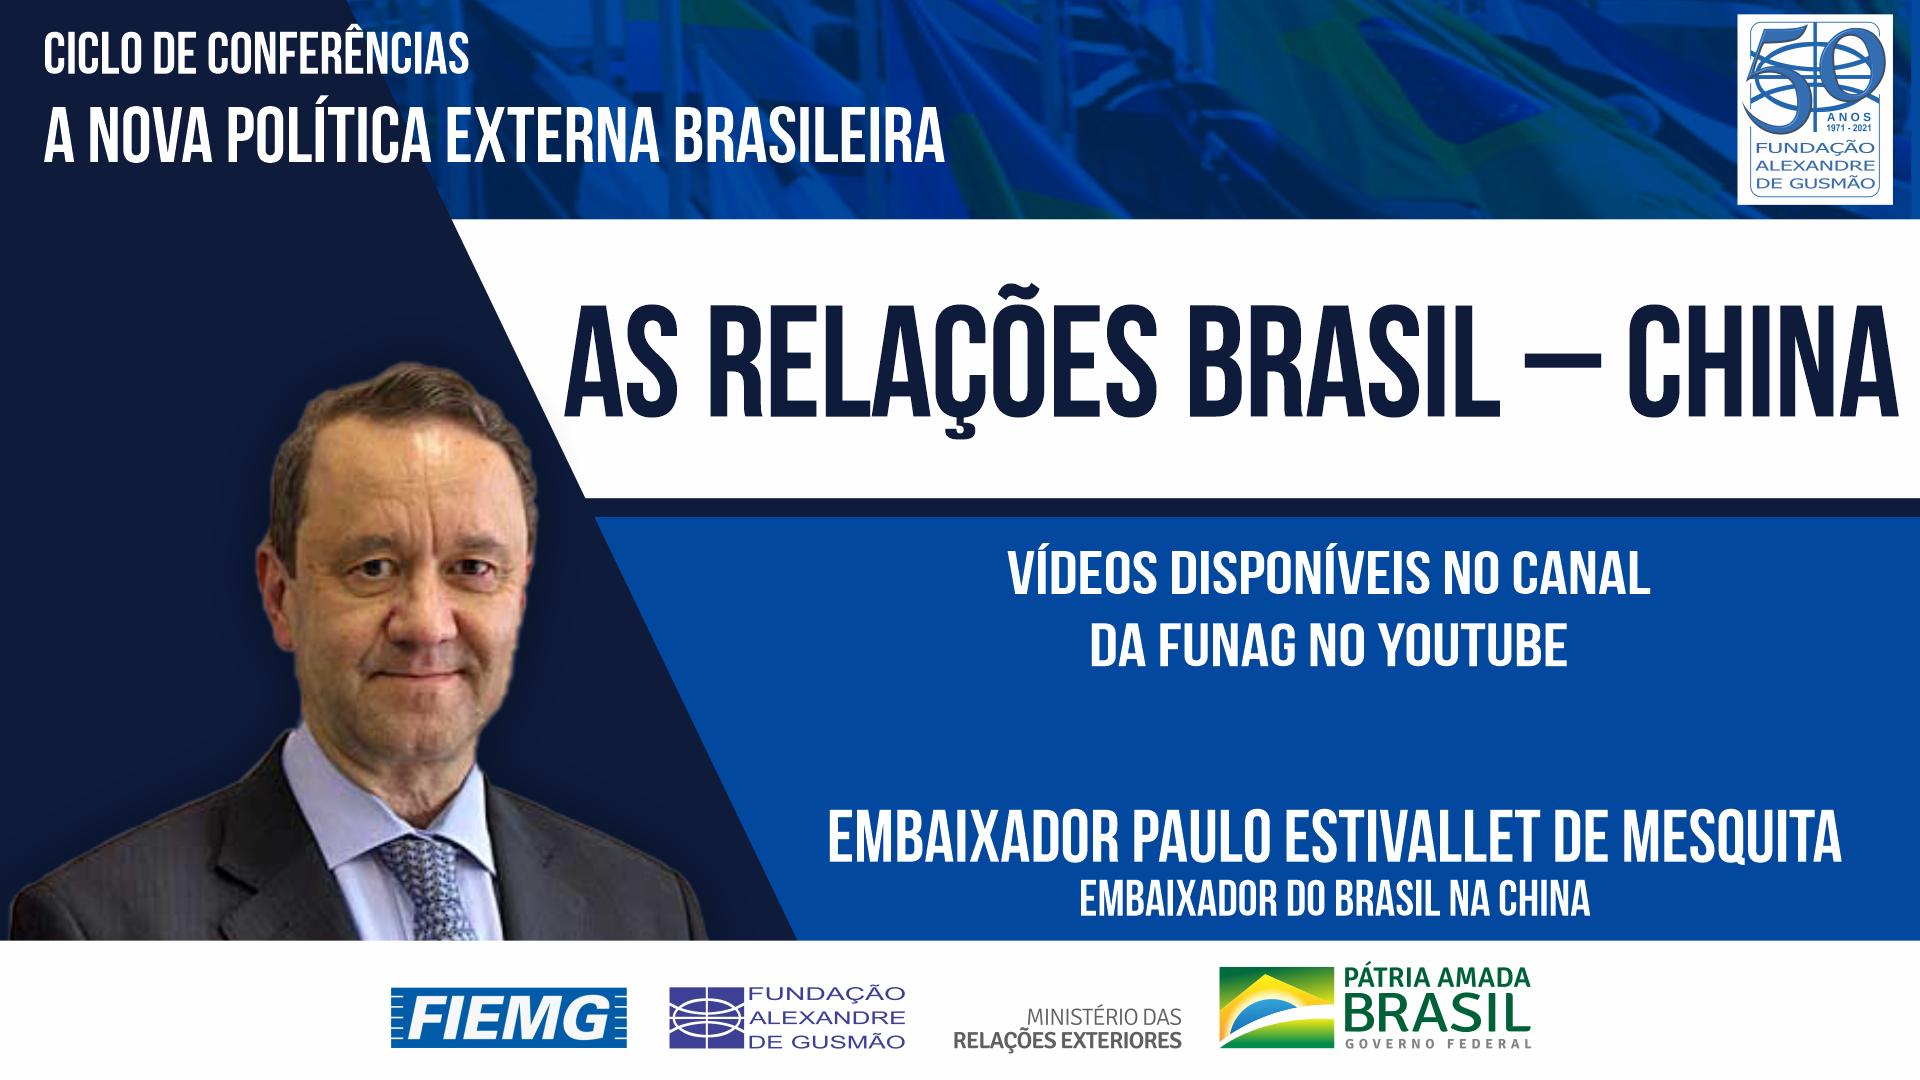 Assista aos vídeos da conferência do Embaixador do Brasil na China, Paulo Estivallet de Mesquita